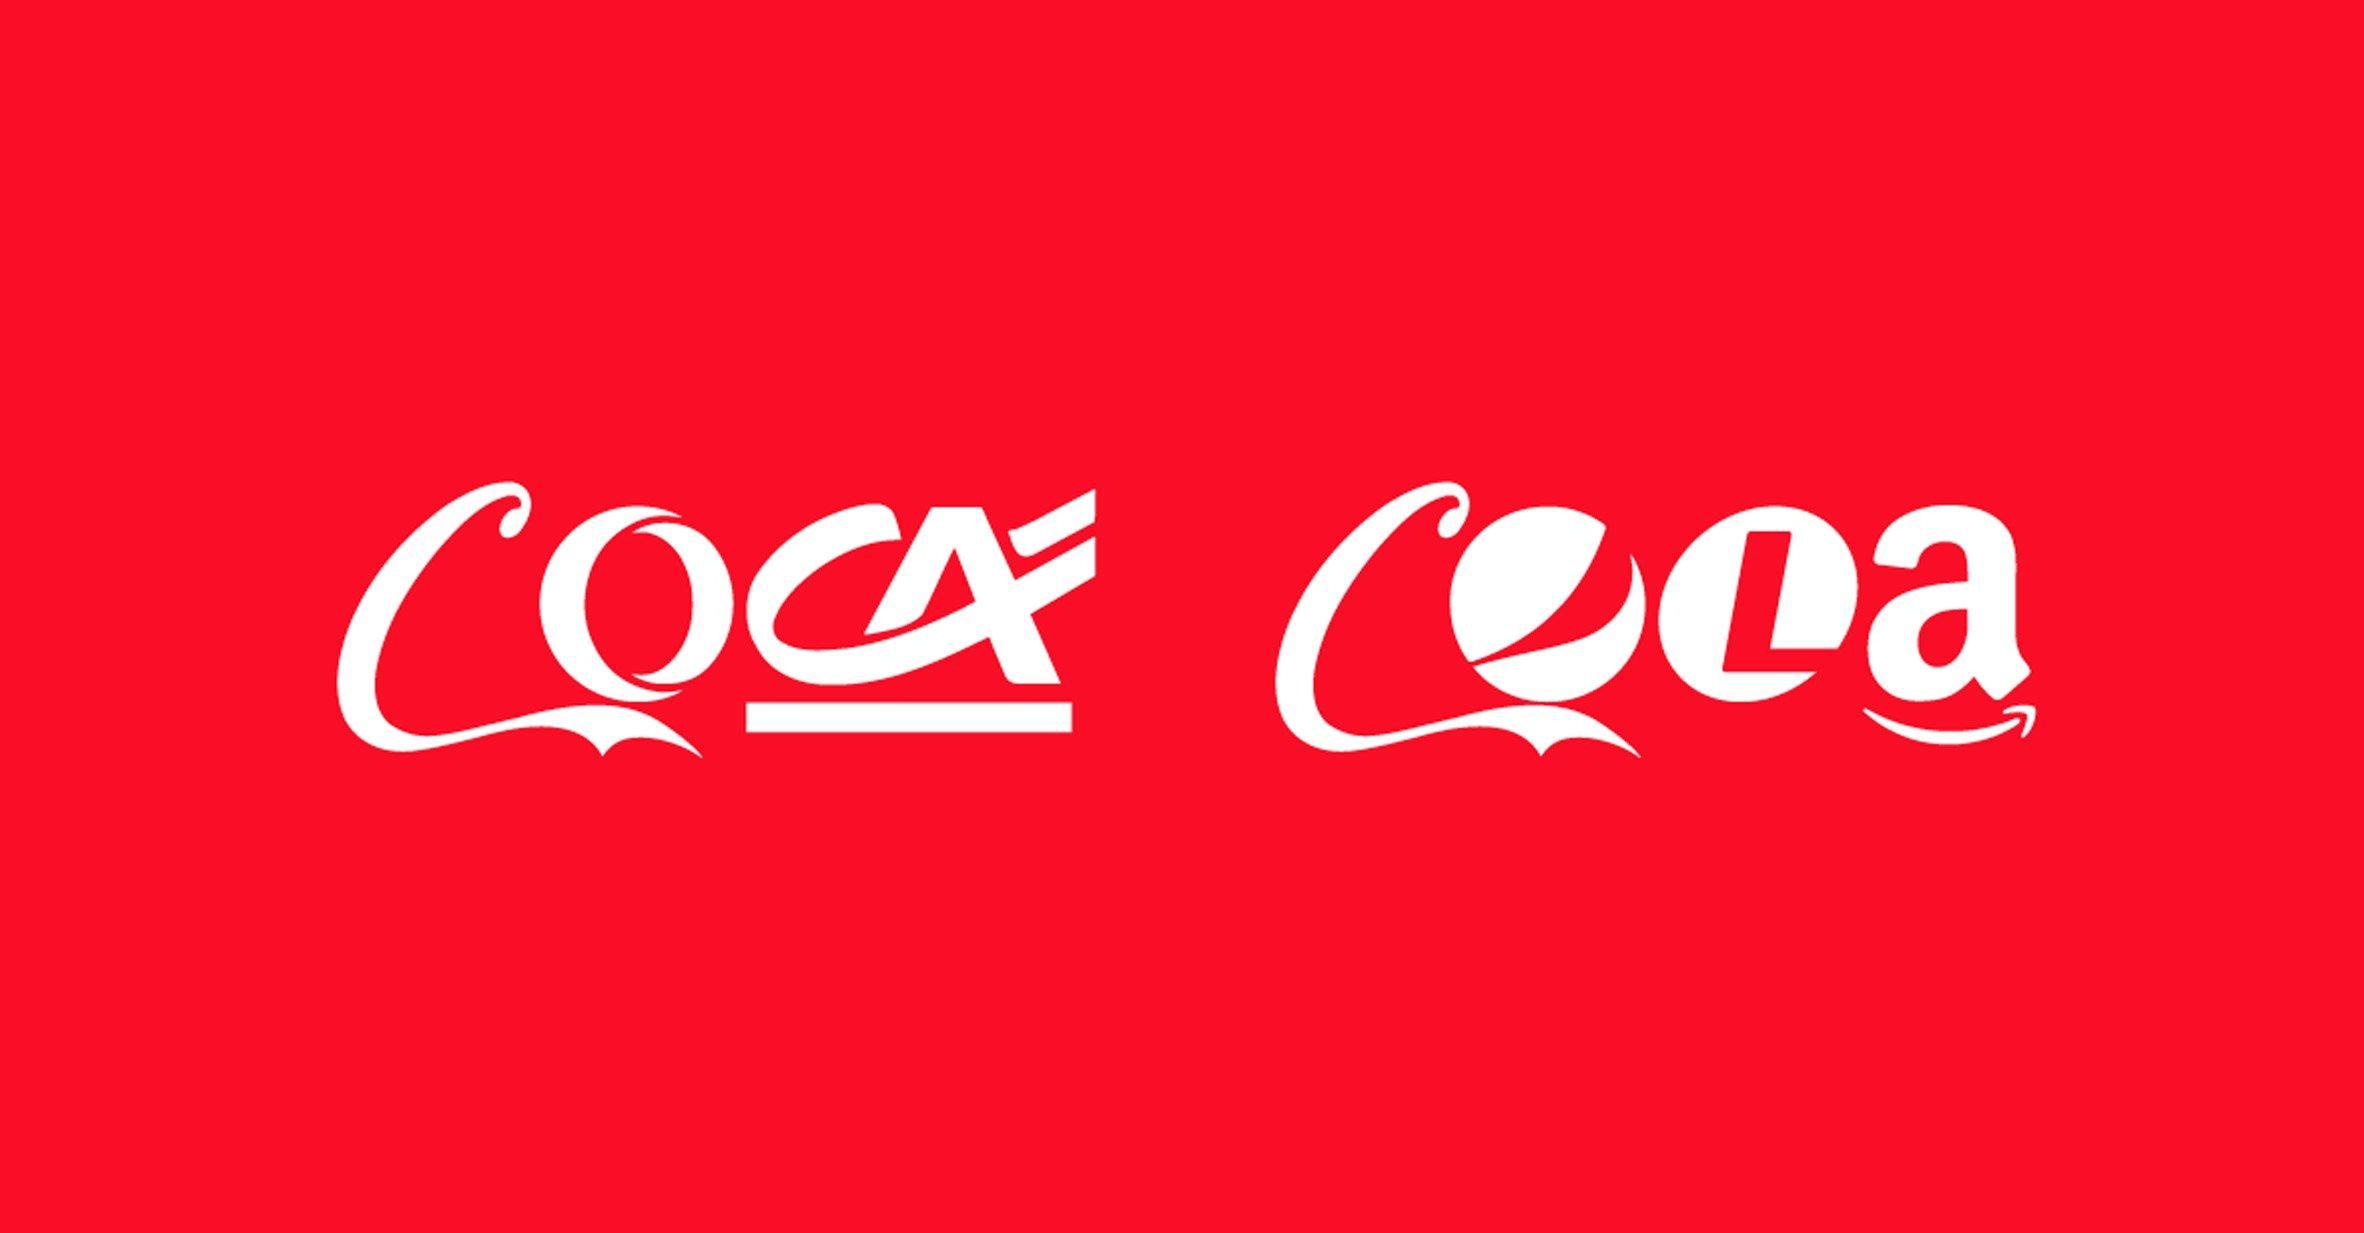 Brand New Roman Font Logo CocaCola